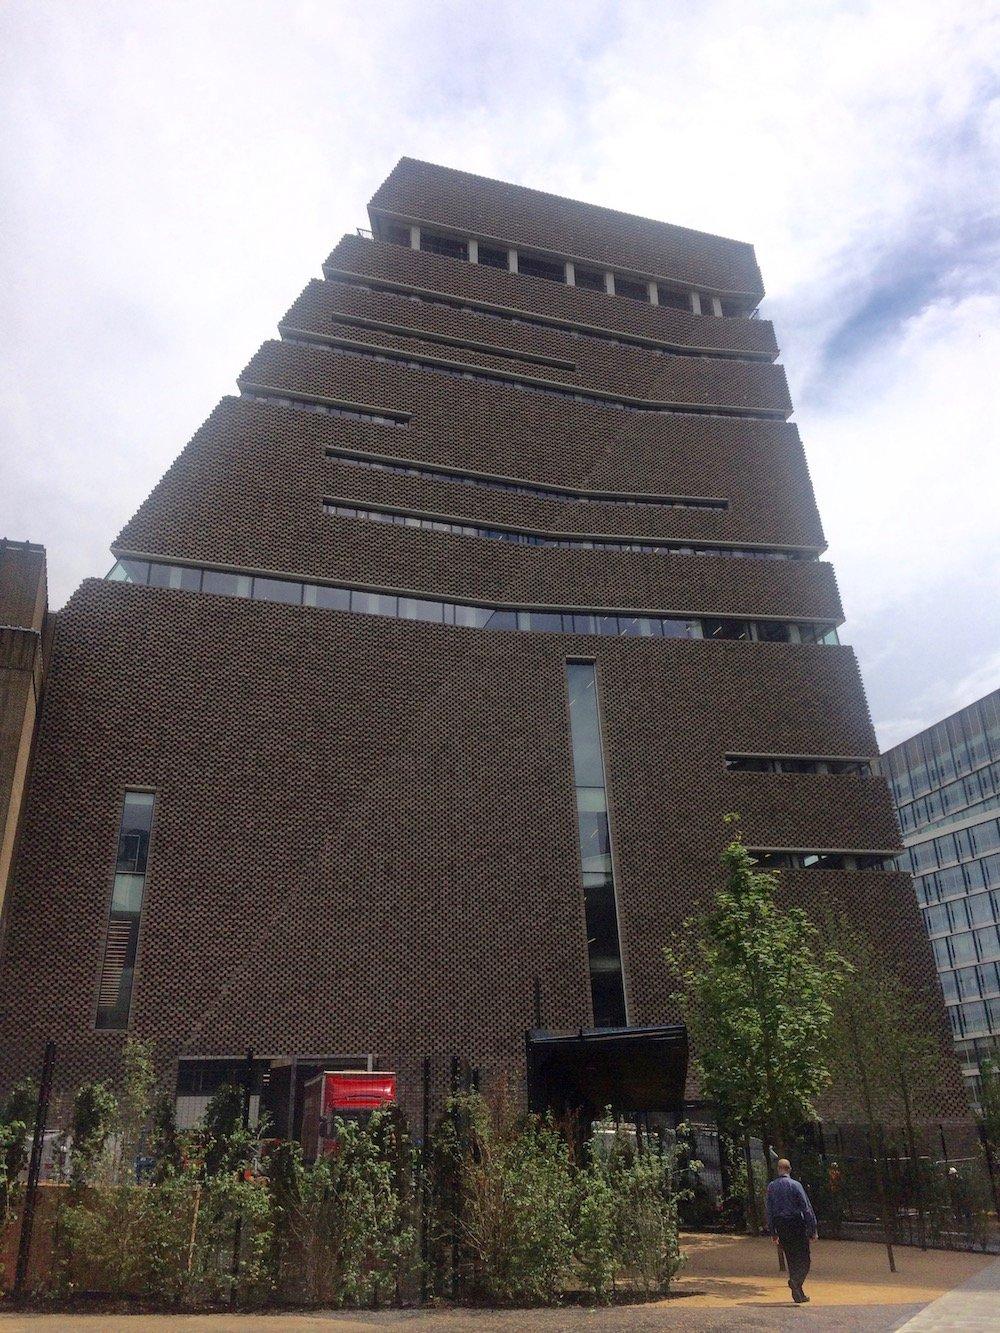 Switch House Tate Modern © Design Talks